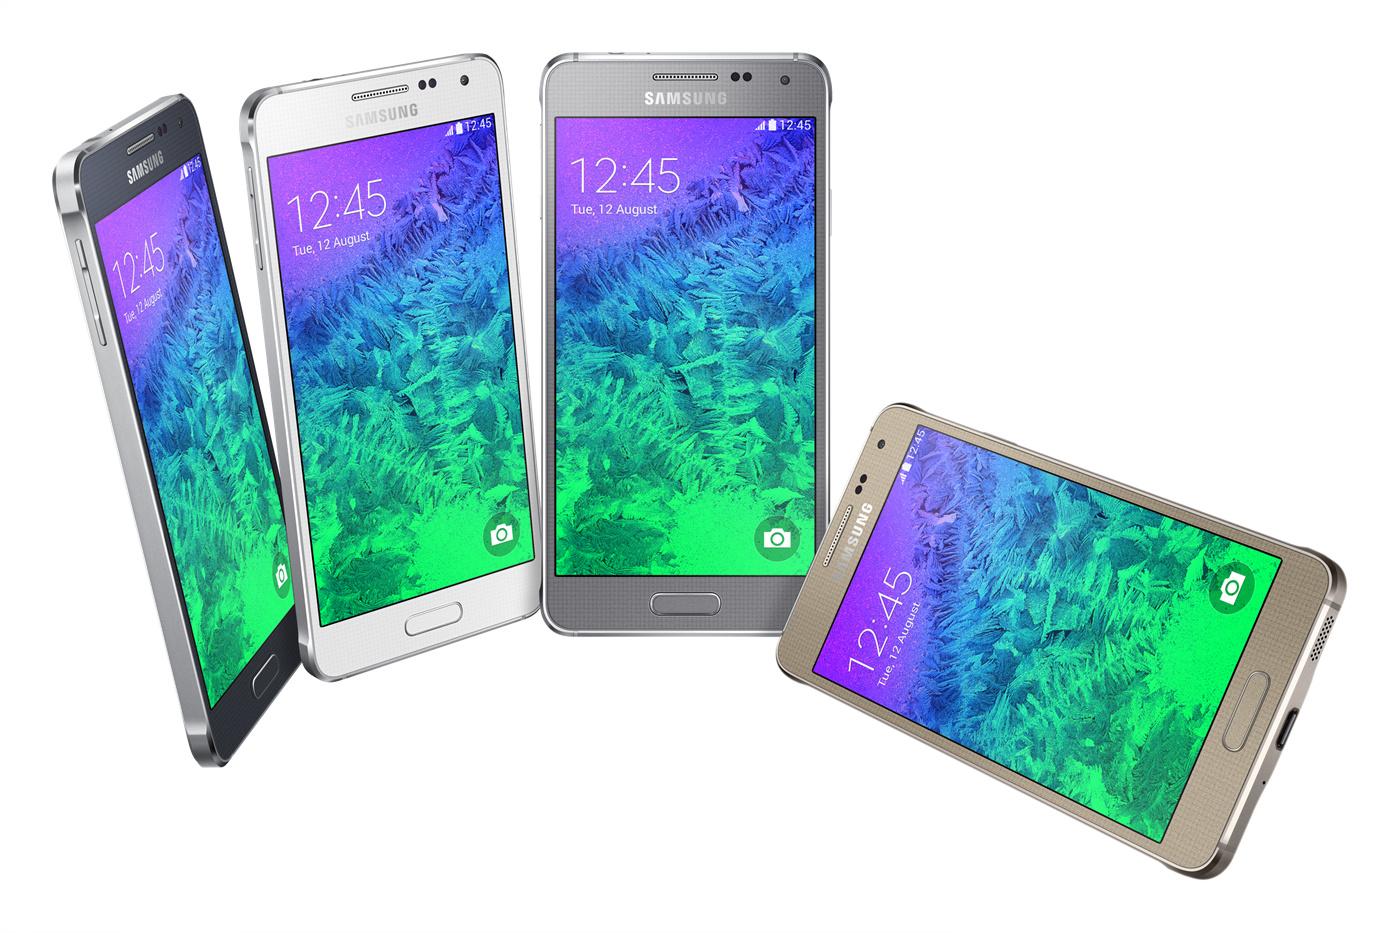 Samsung Galaxy Alpha